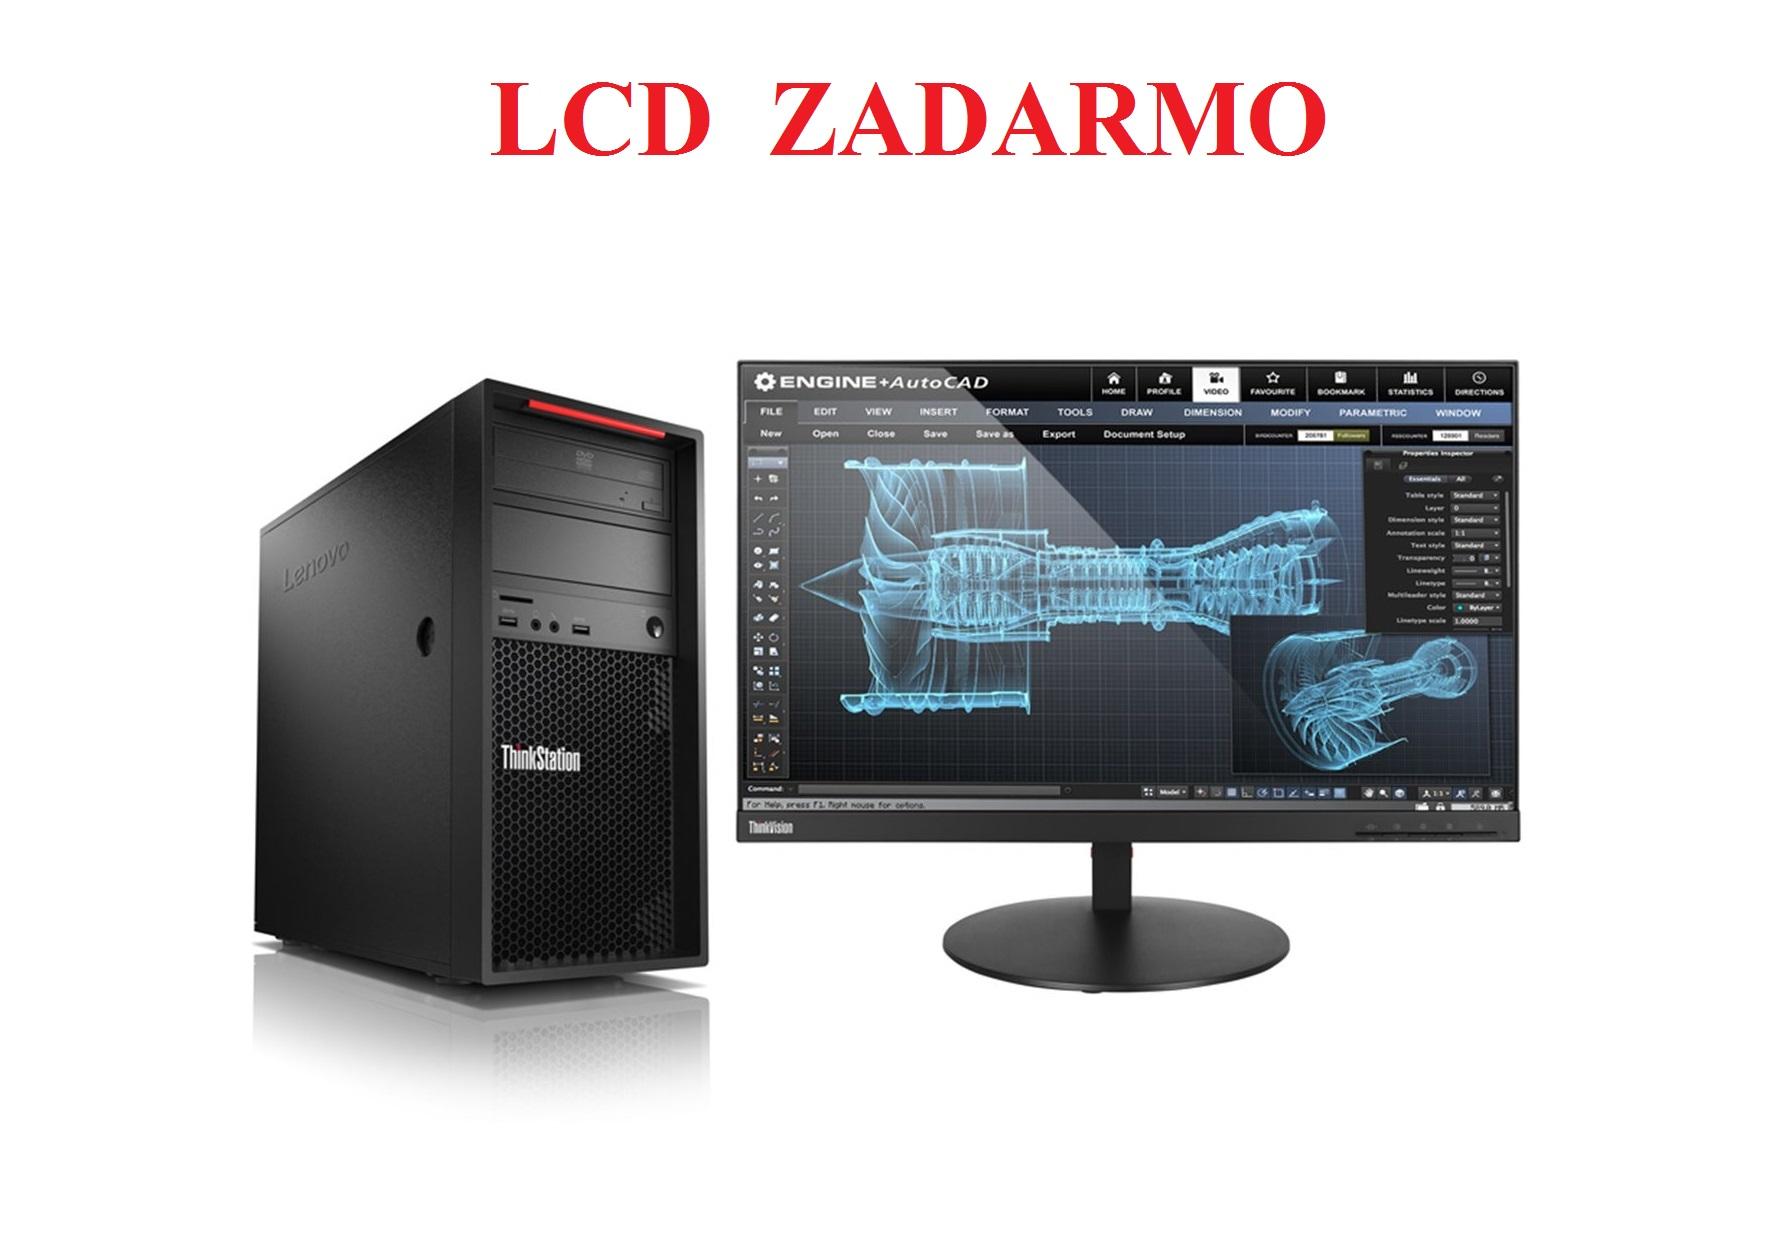 TS P320 TWR/i7-7700/2x8GB/512SSD/DVD/W10P